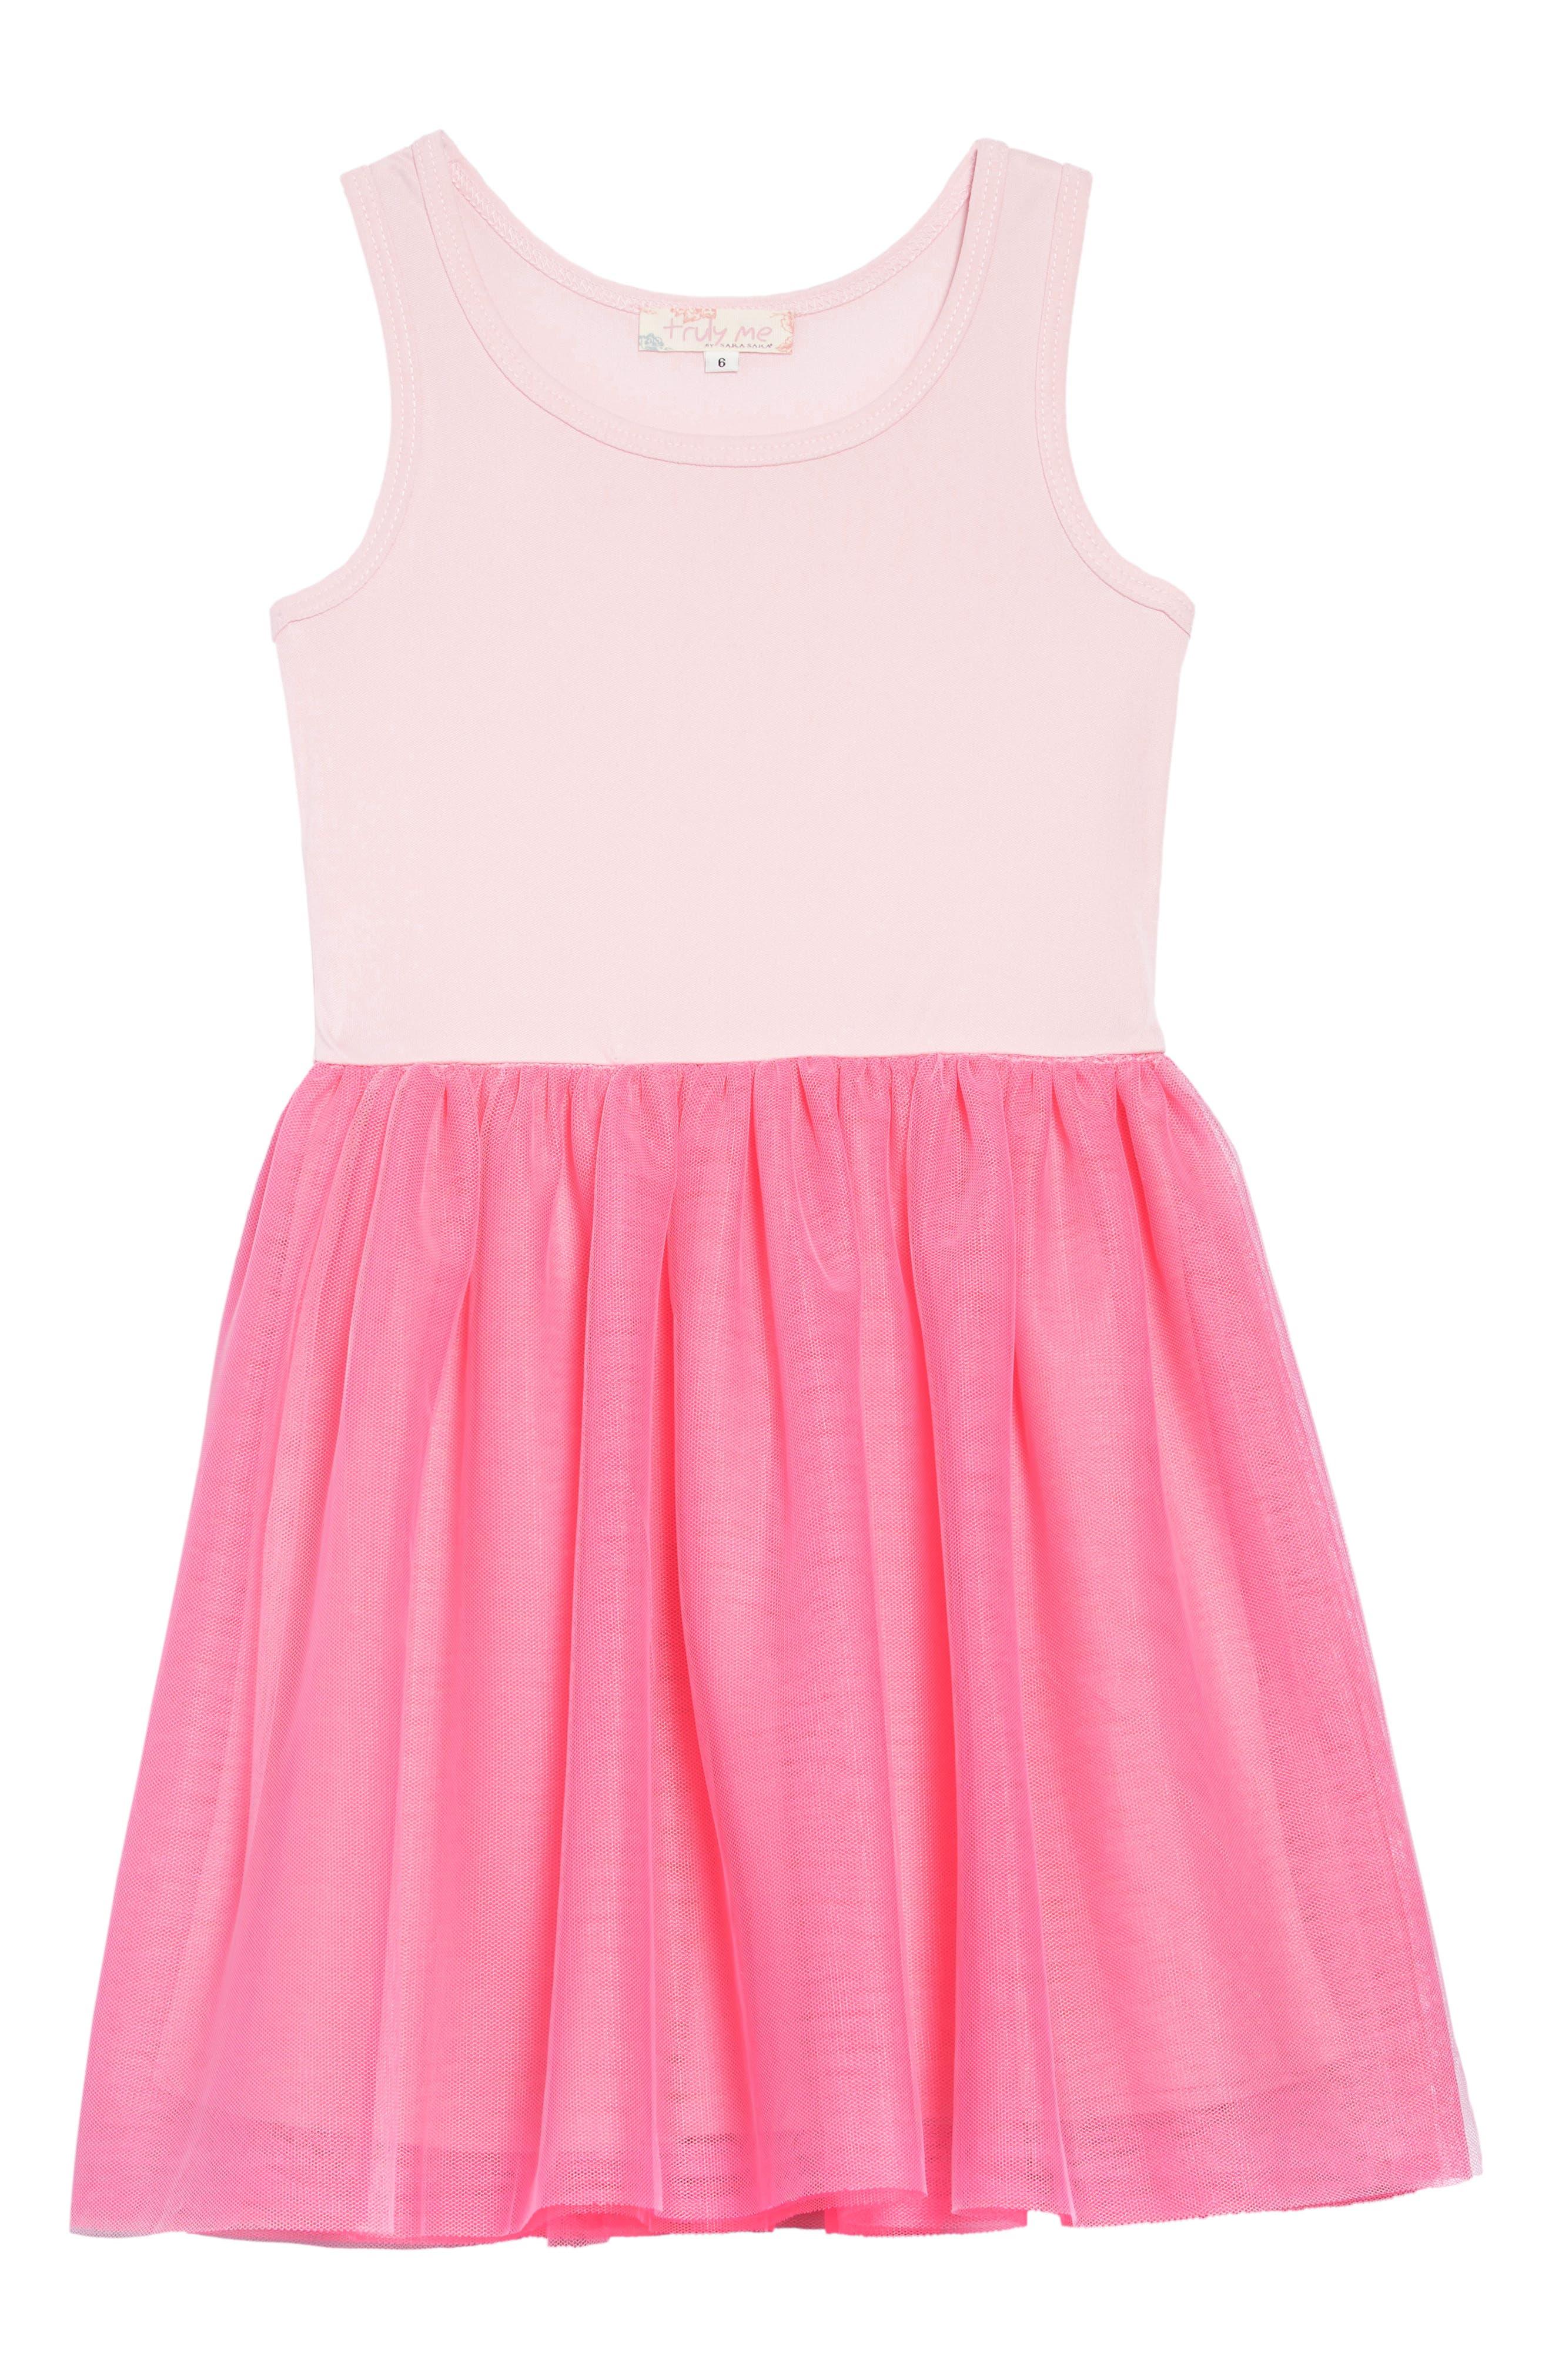 TRULY ME,                             Love Dress Set,                             Alternate thumbnail 3, color,                             GREY PINK